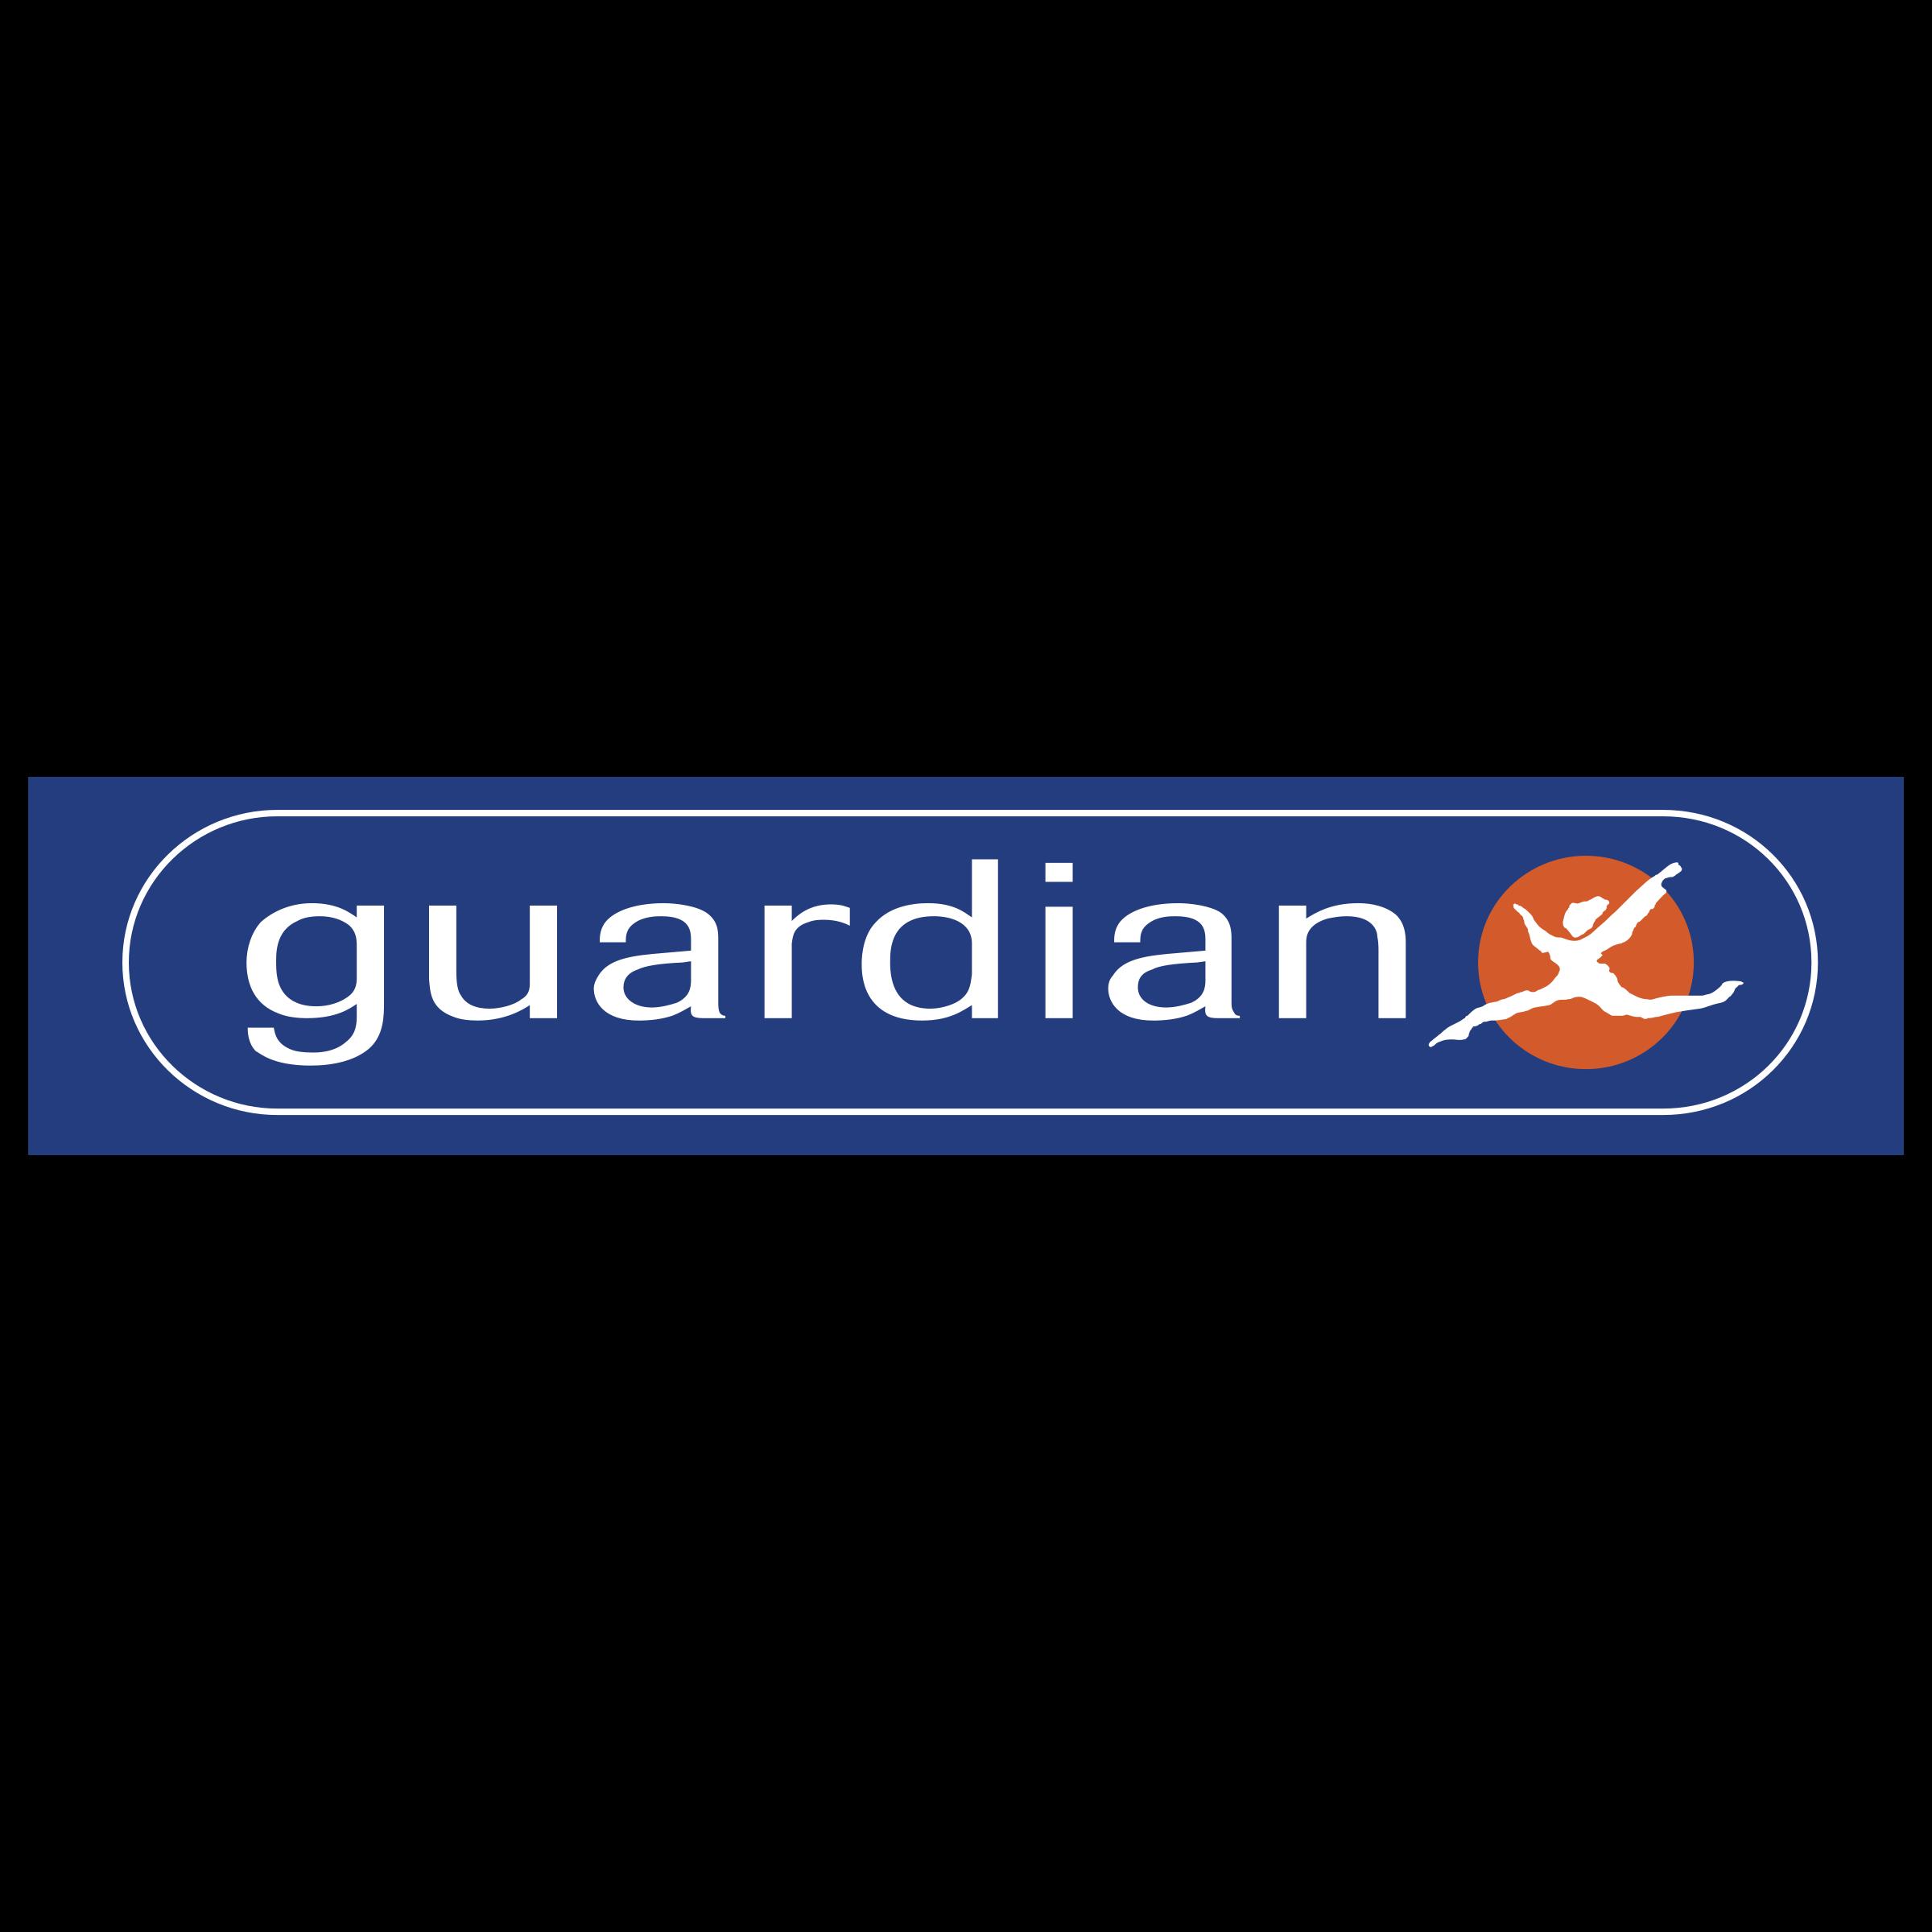 Guardian Logo PNG Transparent & SVG Vector.